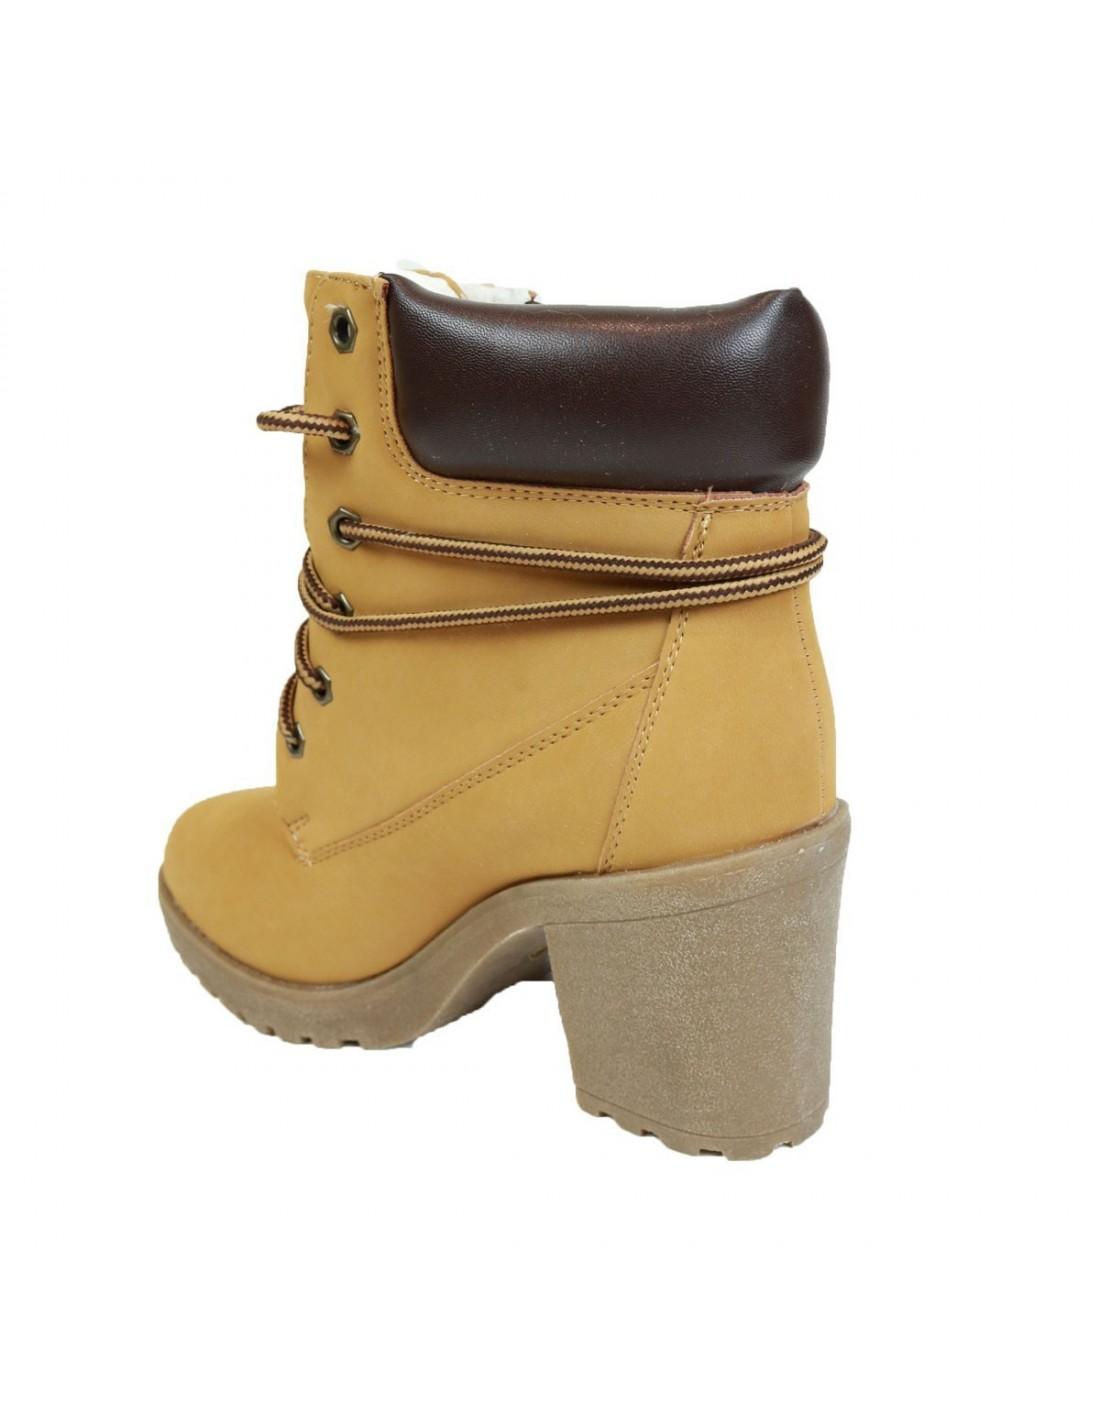 boots femme camel type rangers talons enti rement fourr es. Black Bedroom Furniture Sets. Home Design Ideas